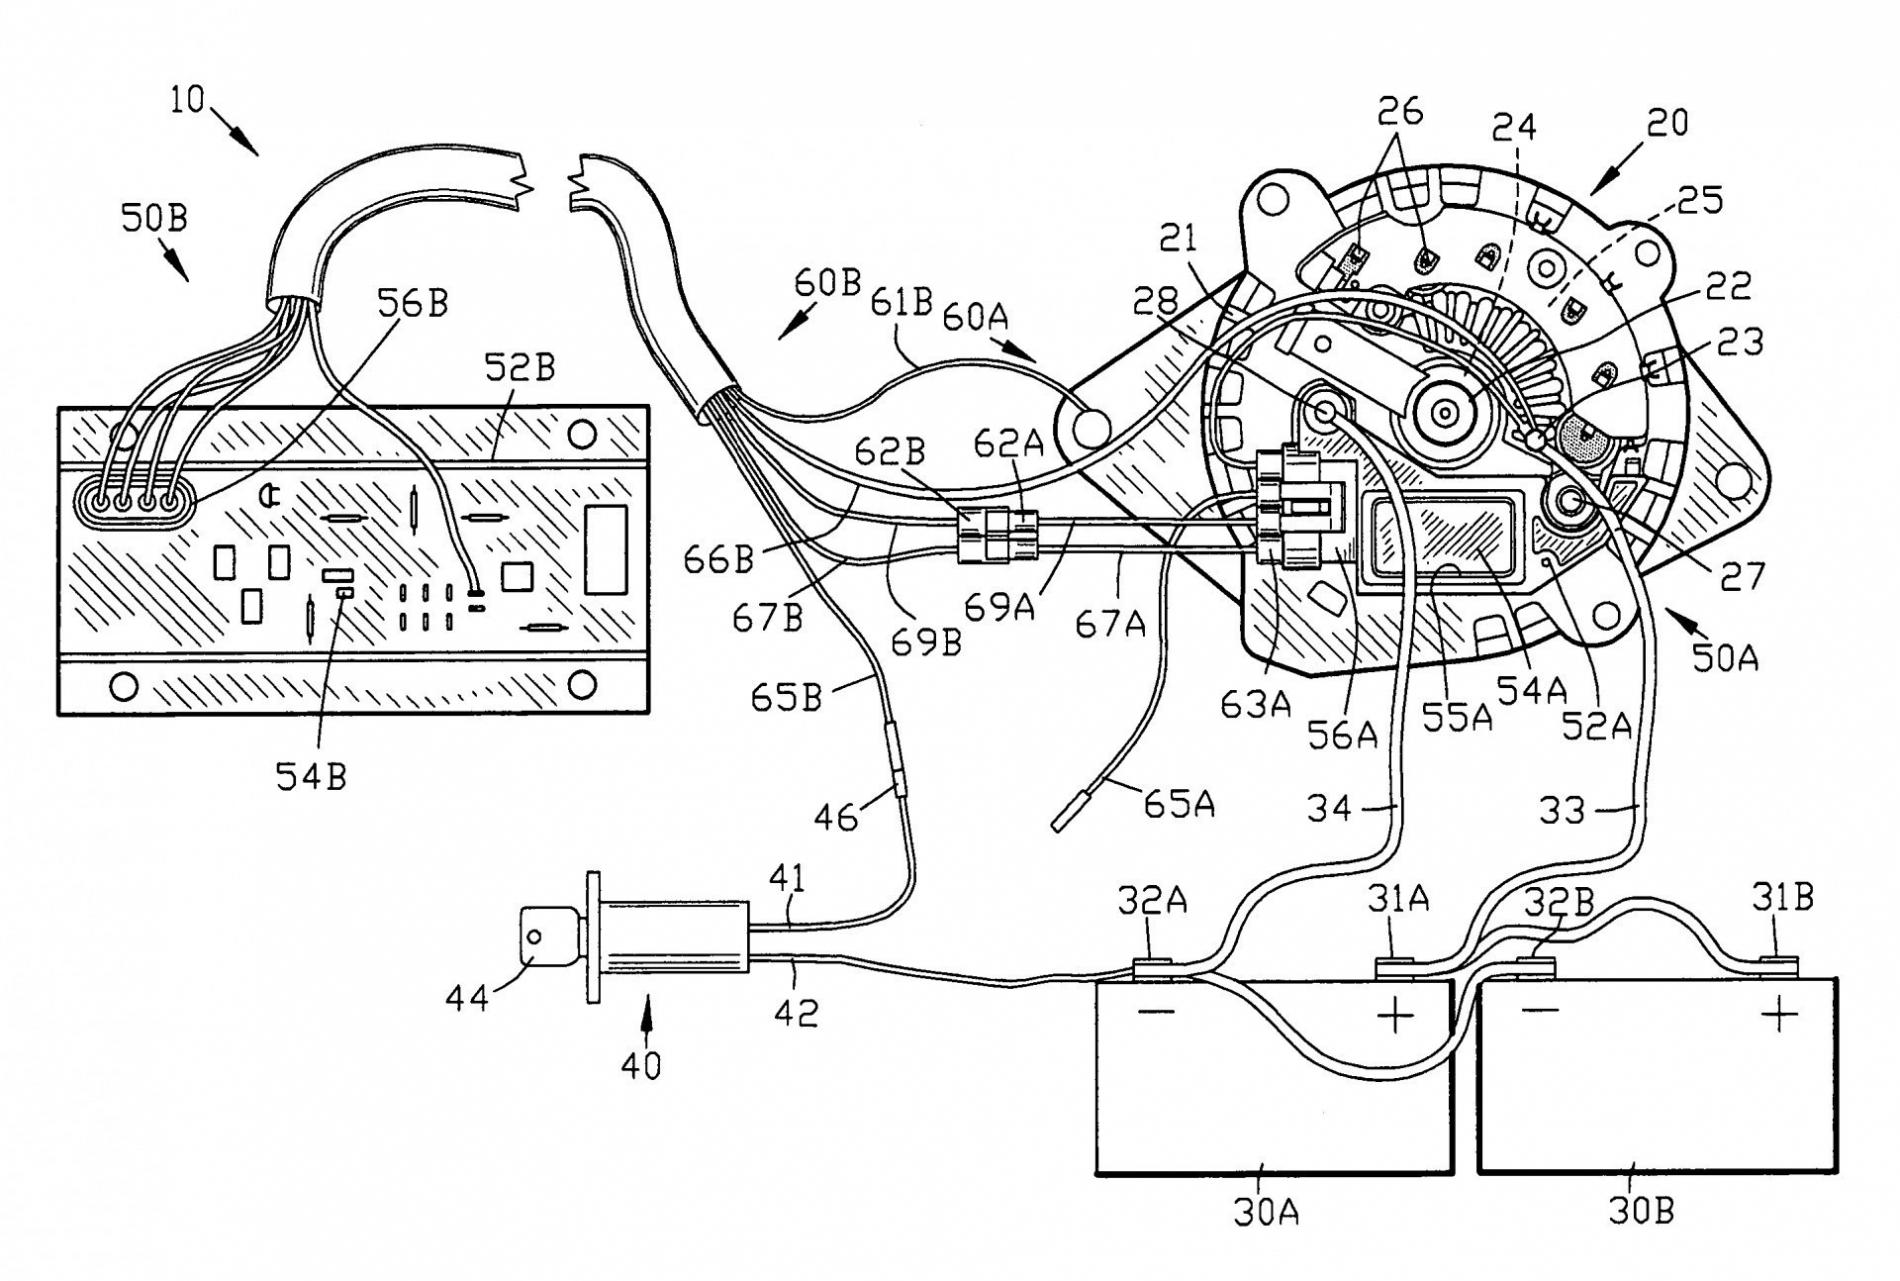 Ford Alternator External Regulator Wiring Diagram | Wiring Diagram - Ford Alternator Wiring Diagram Internal Regulator